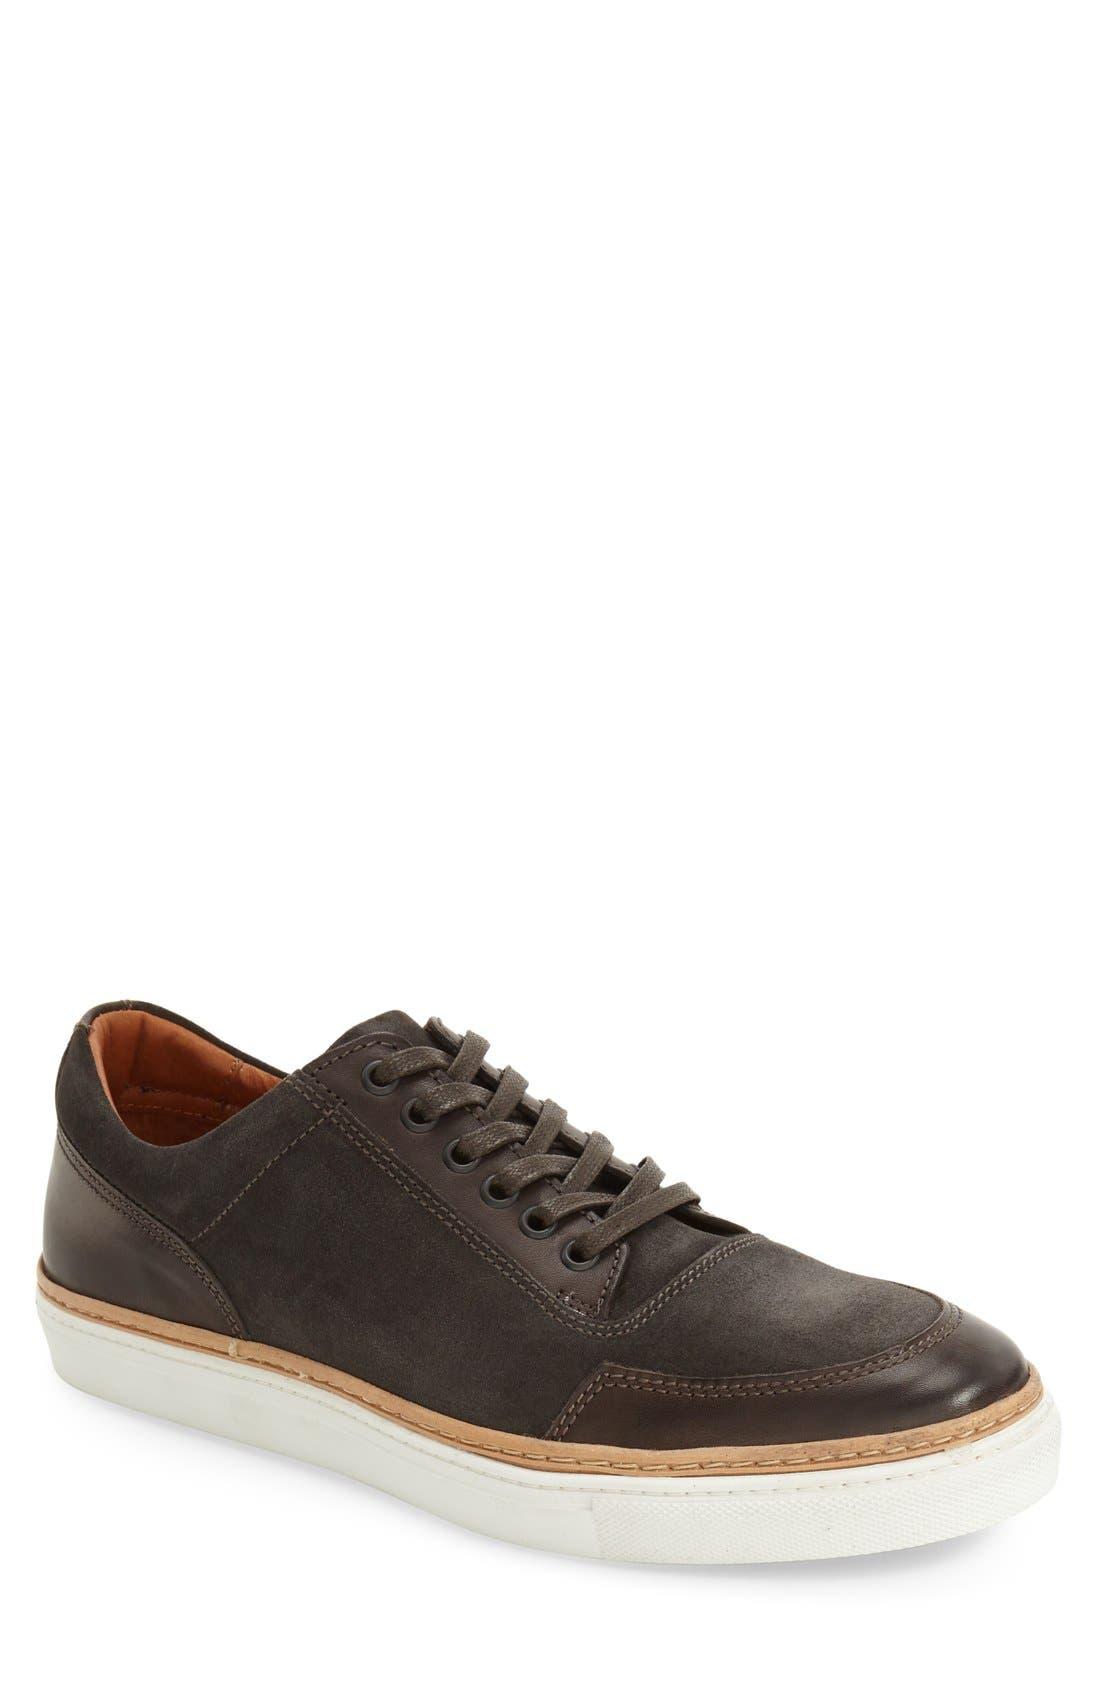 Prem-Ium Sneaker,                         Main,                         color, 020